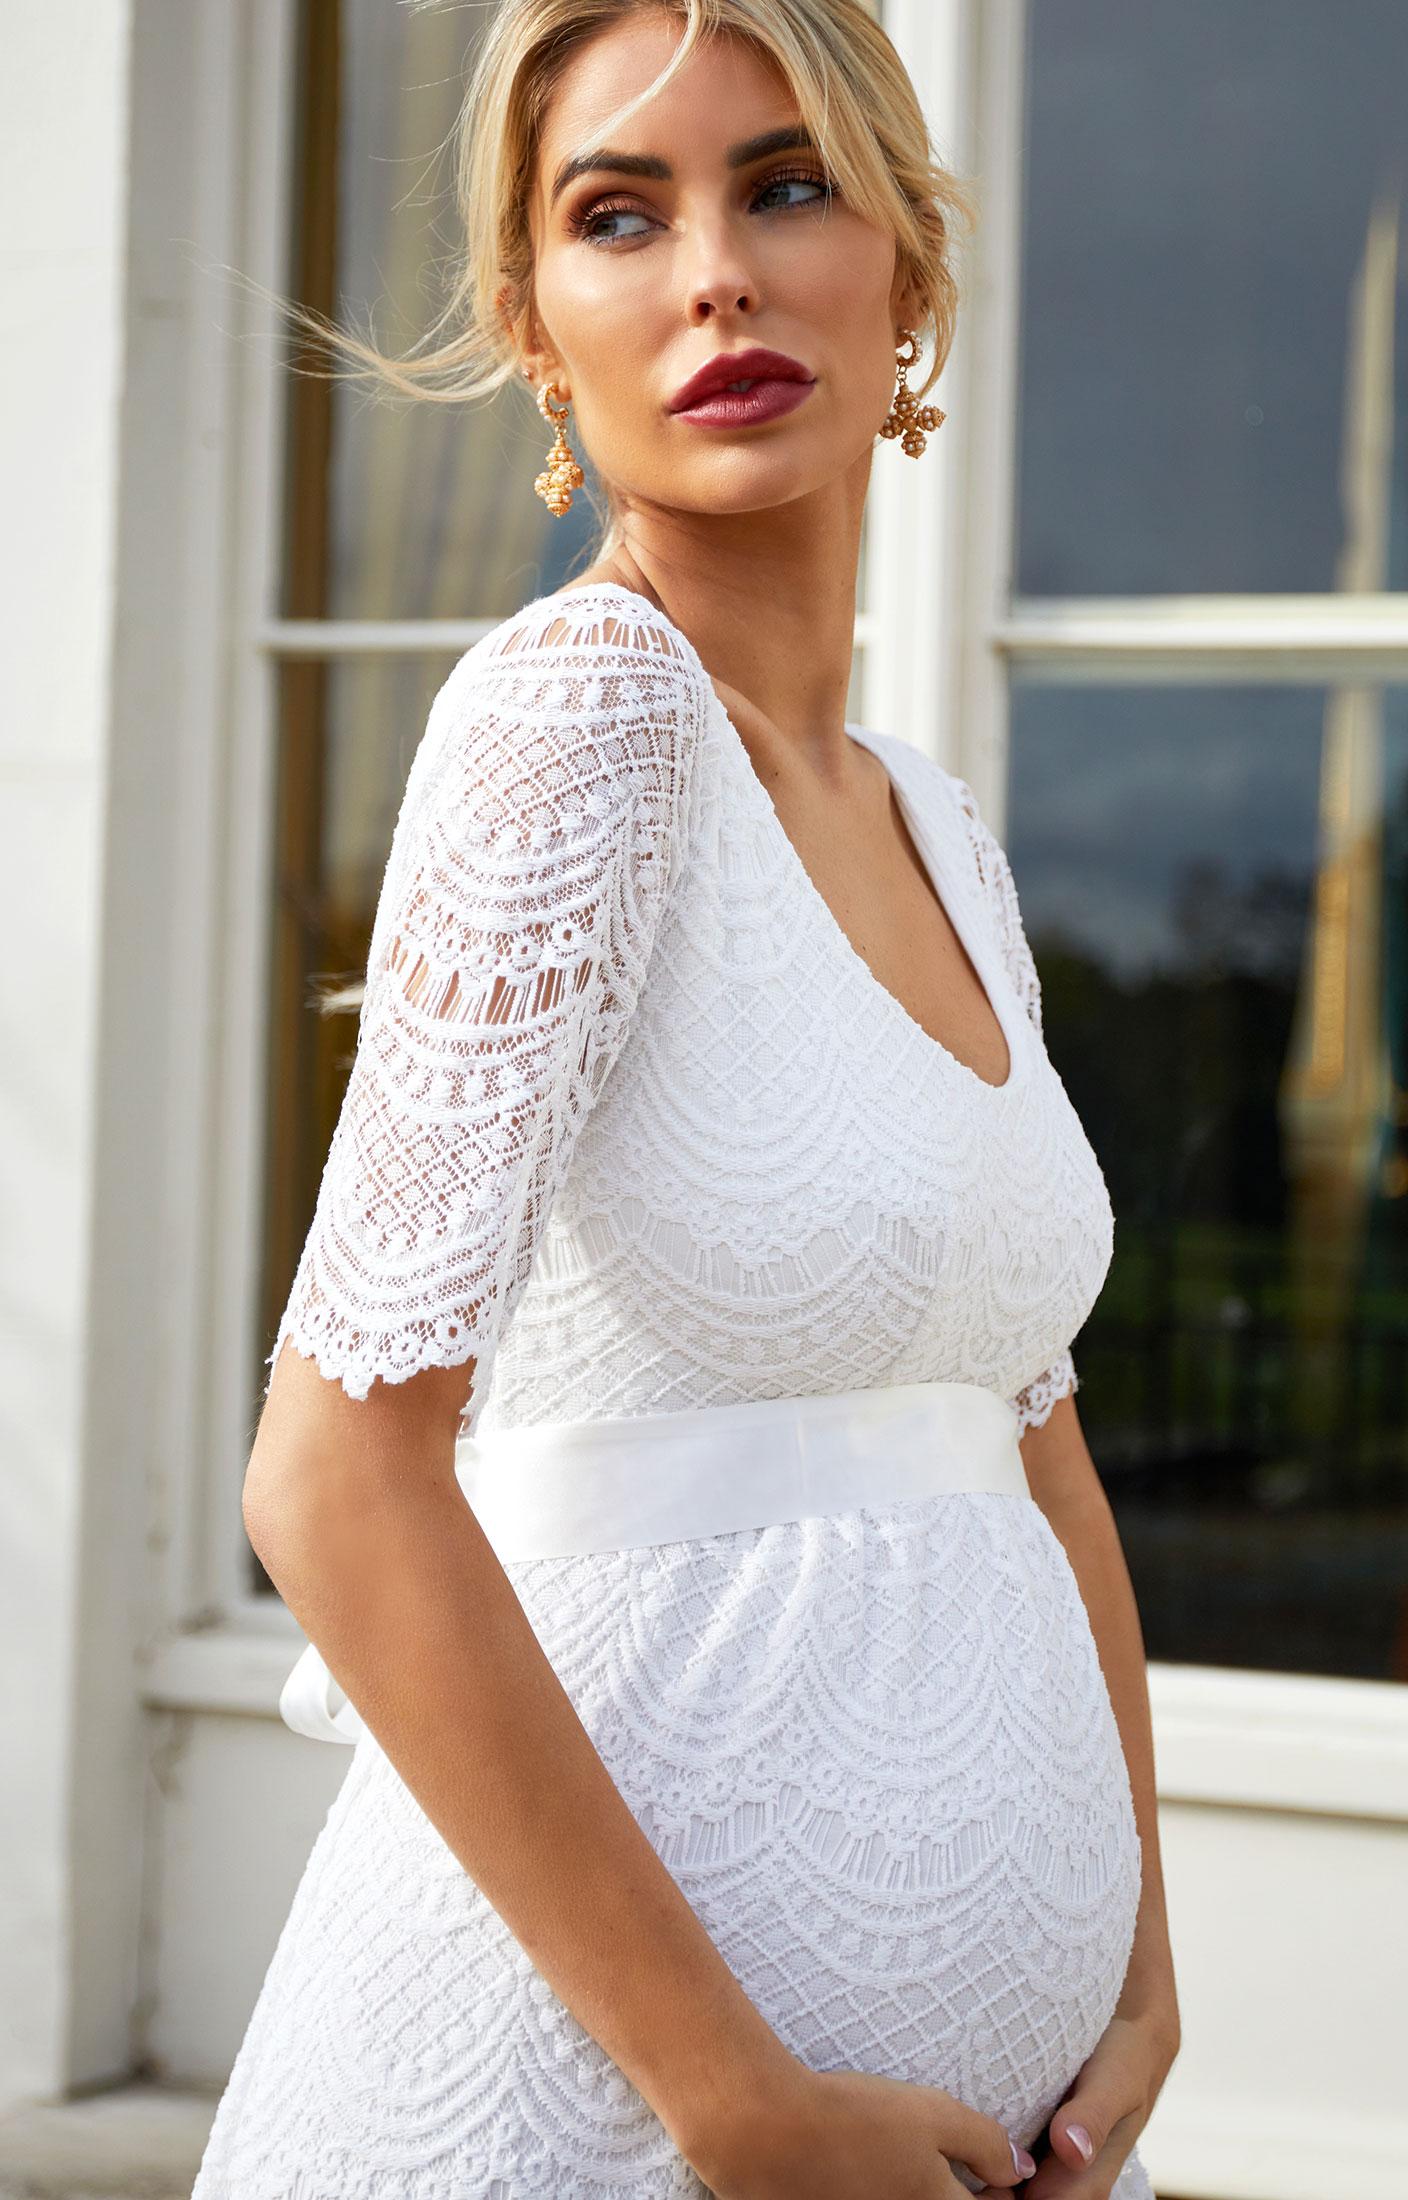 Verona Maternity Wedding Gown (Ivory) - Maternity Wedding Dresses ... f3f21cb9272